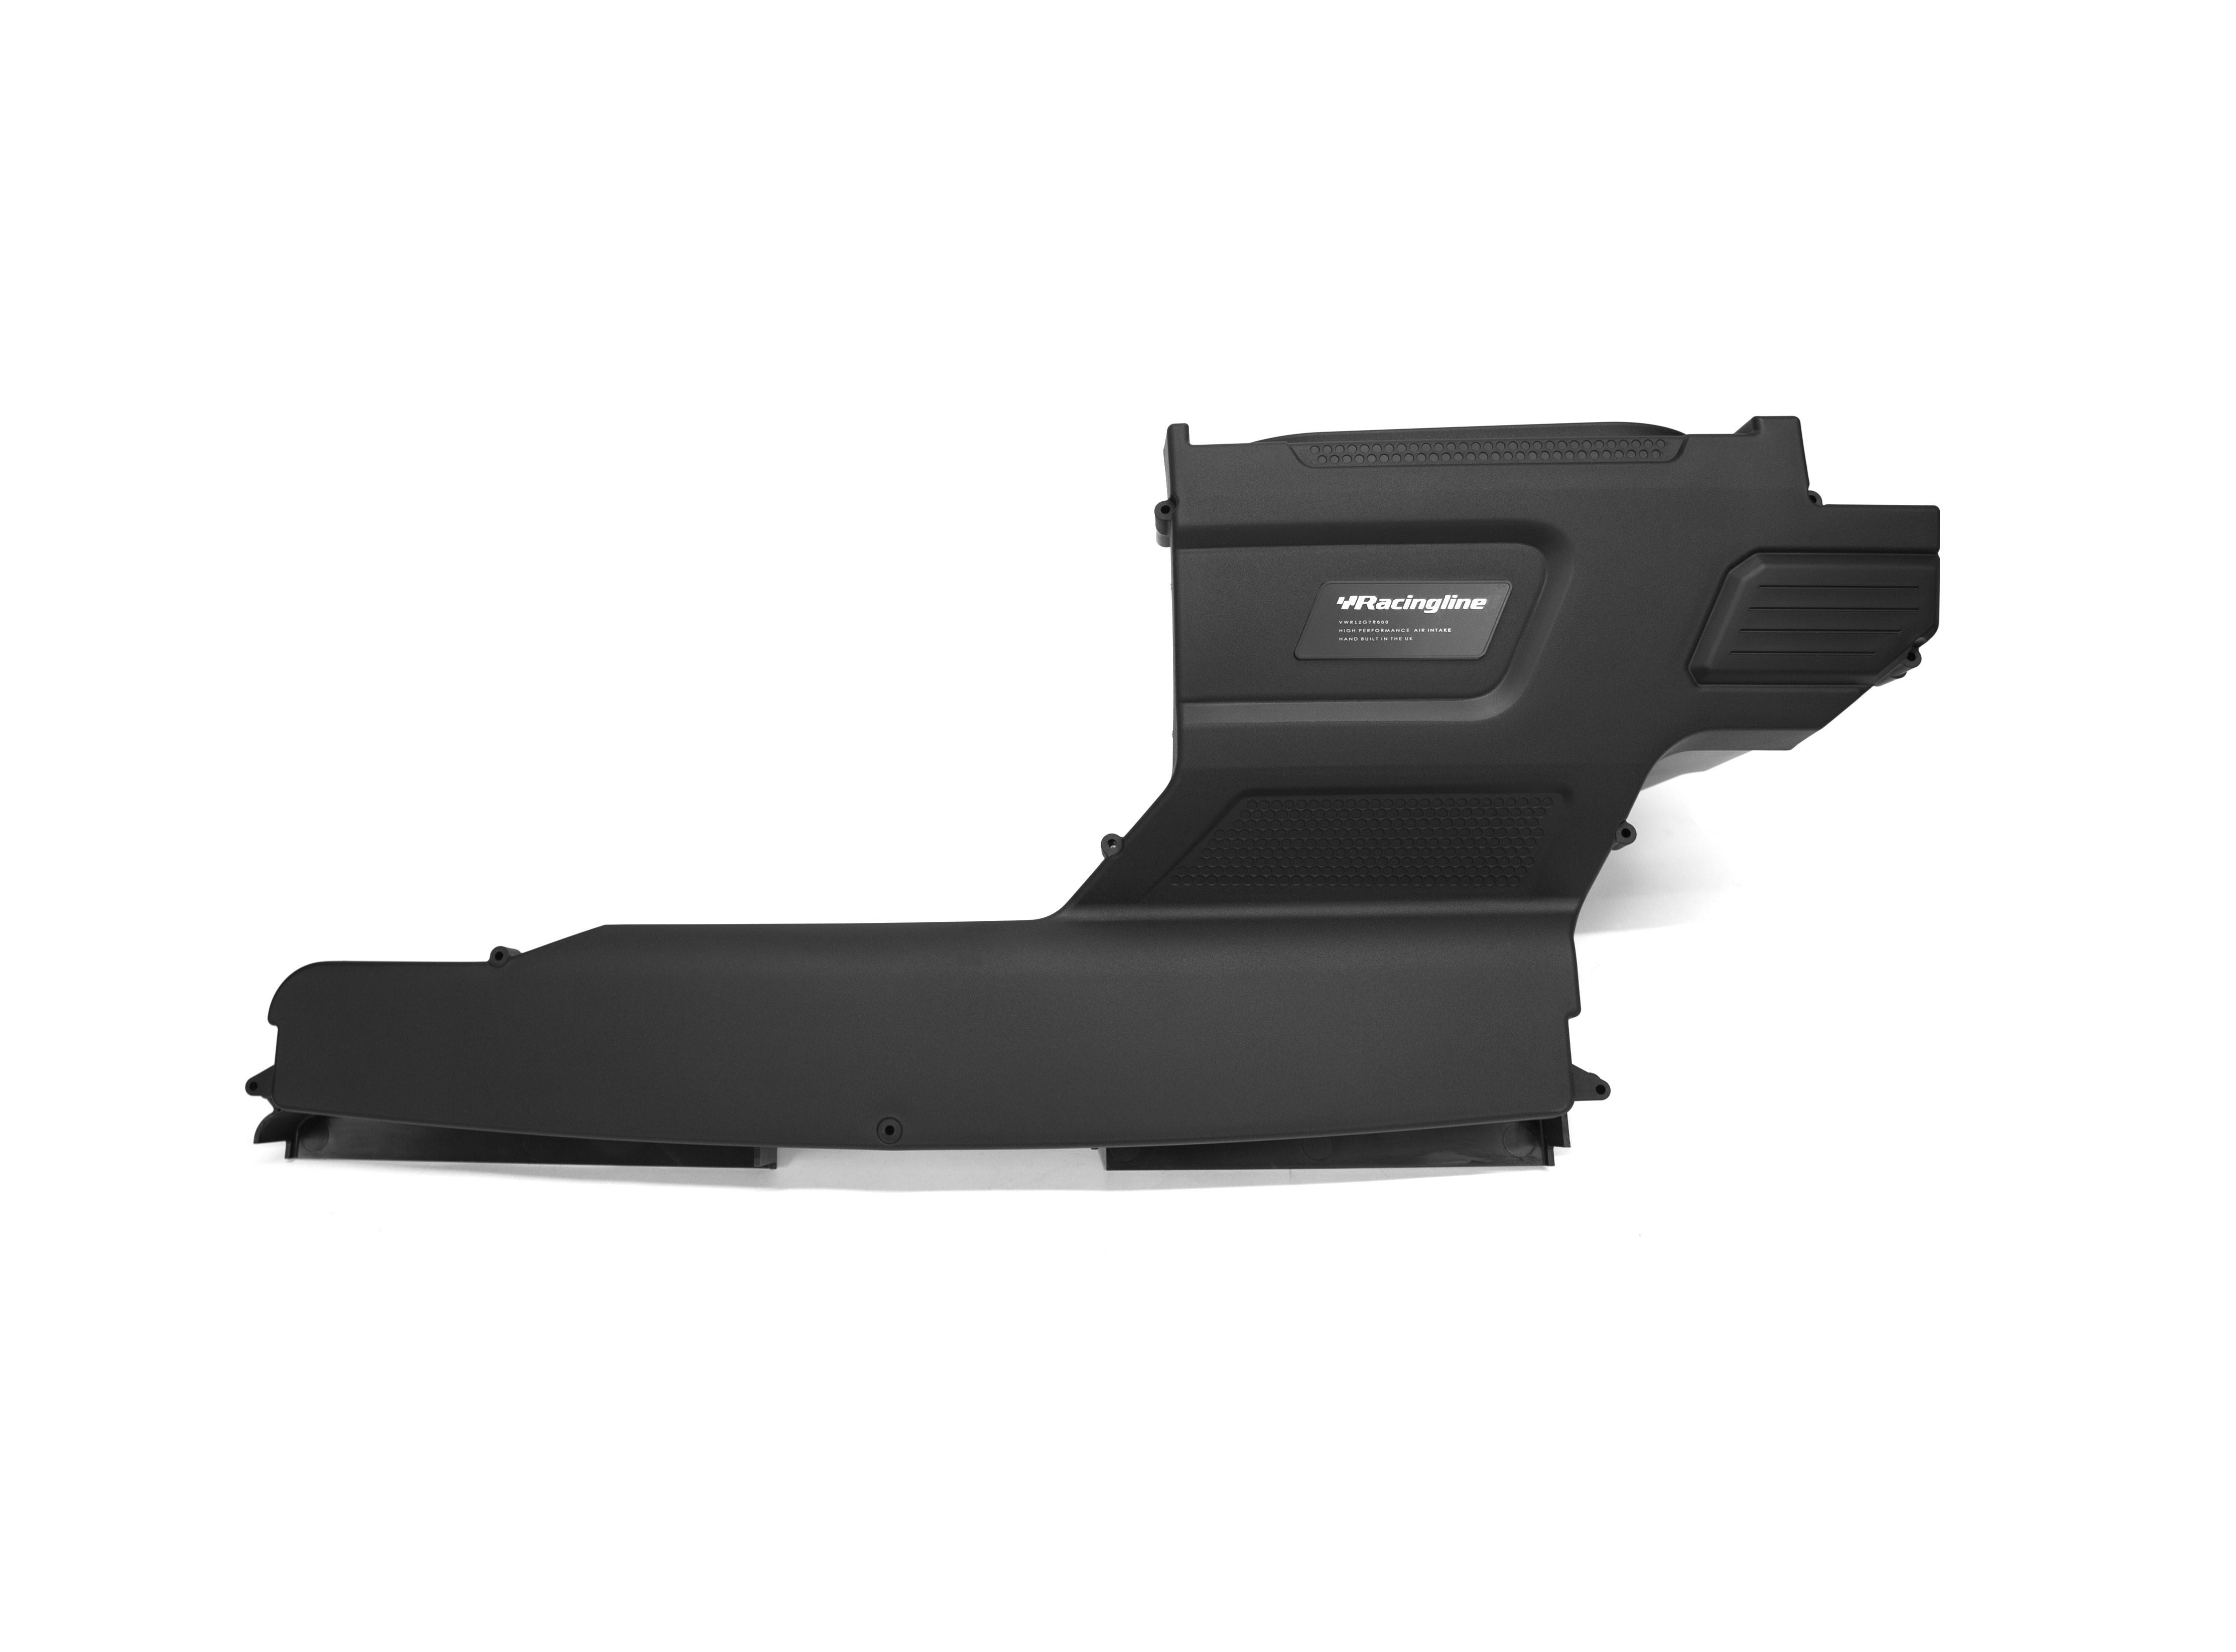 chiptuning seat leon typ 5f 2 0 tsi cupra 280. Black Bedroom Furniture Sets. Home Design Ideas